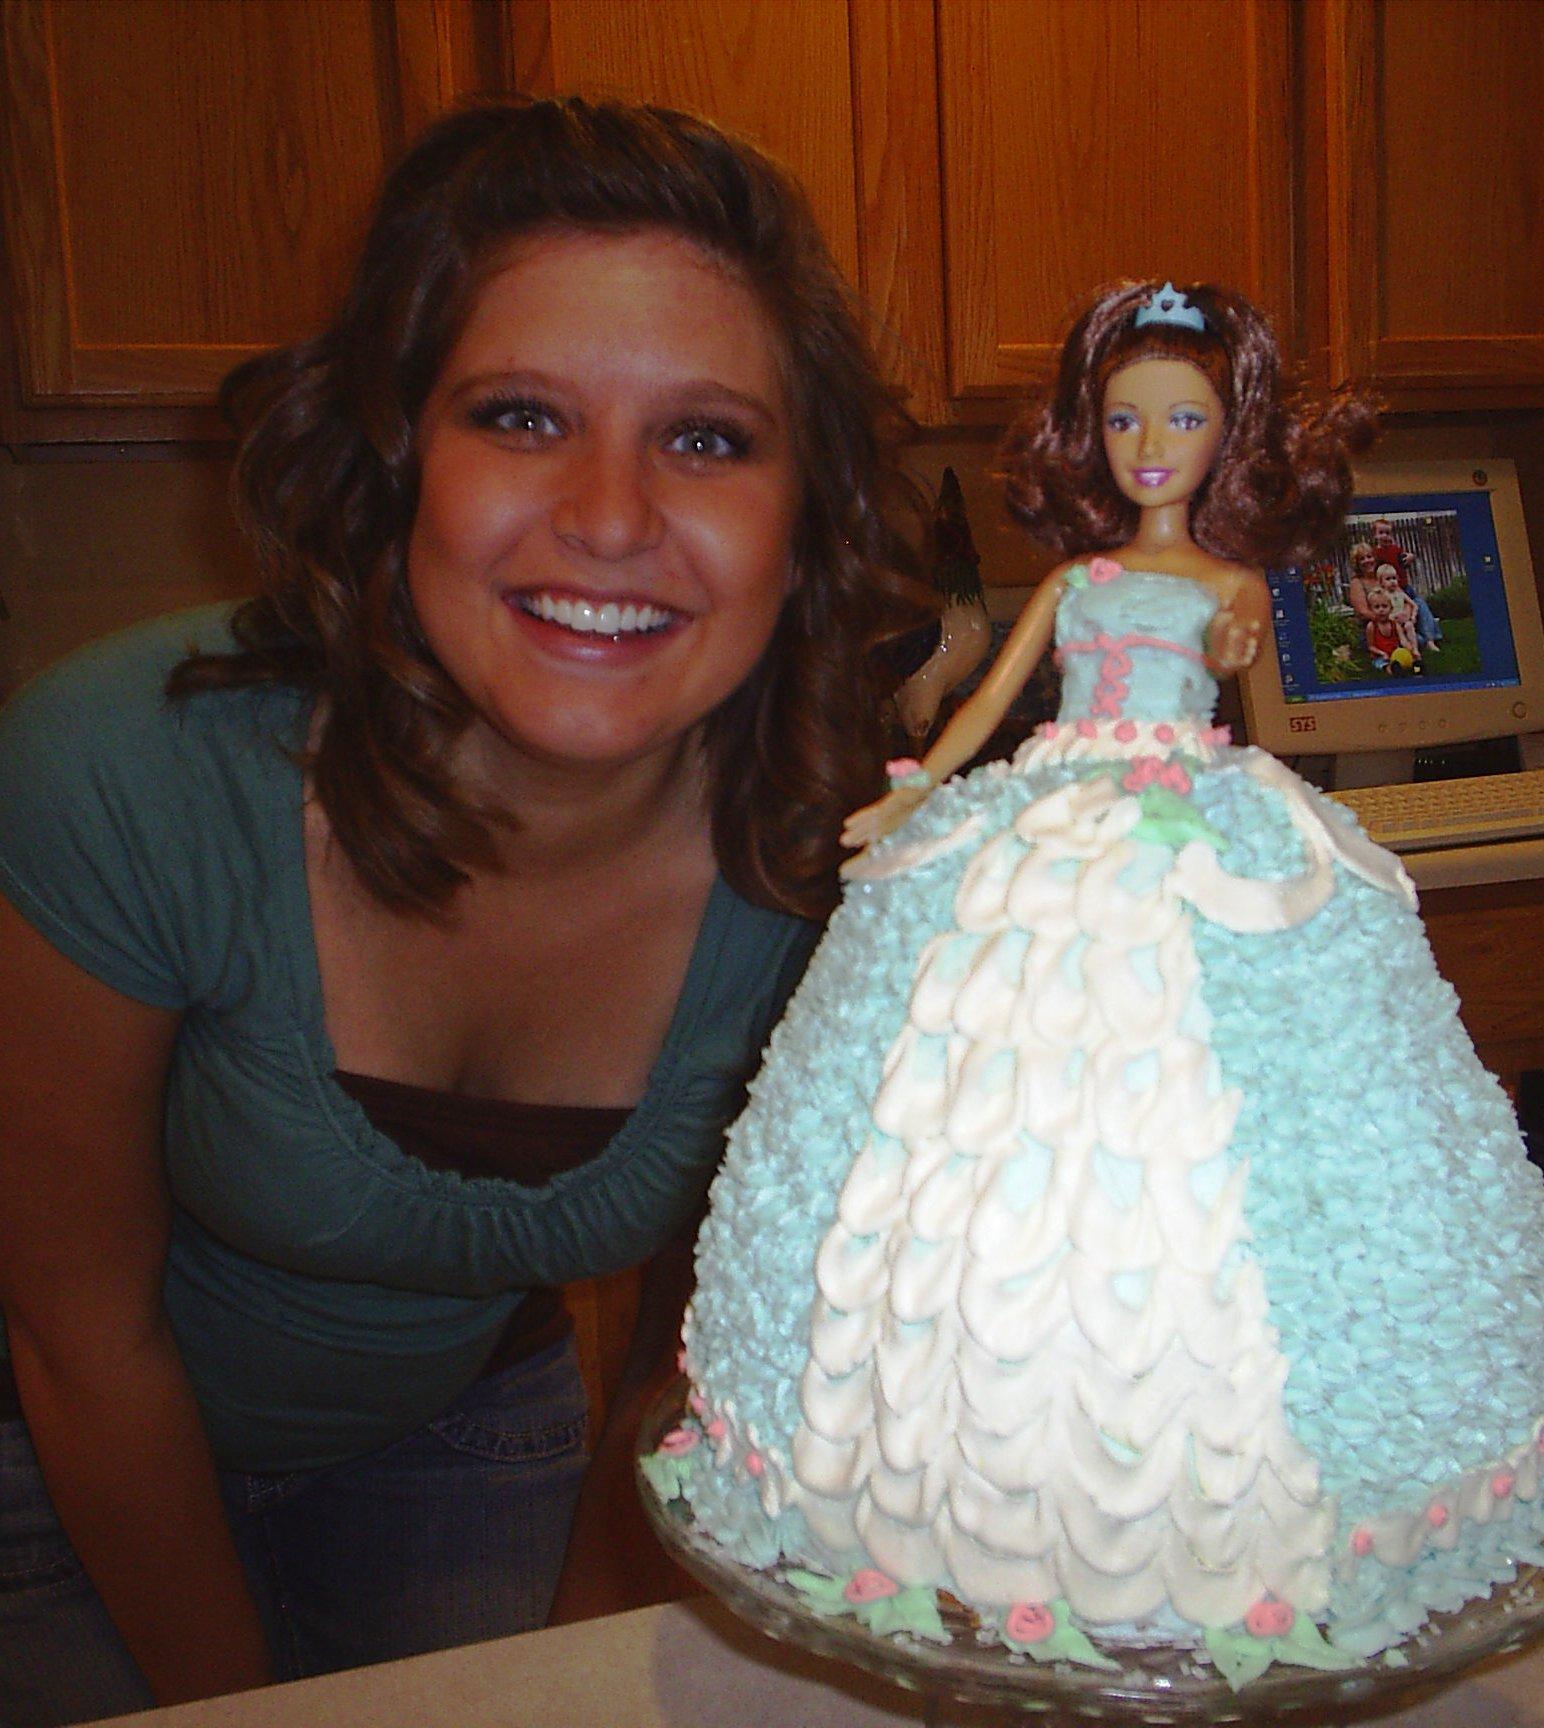 barbie-cake-12.JPG jeanierhoadesdotcom